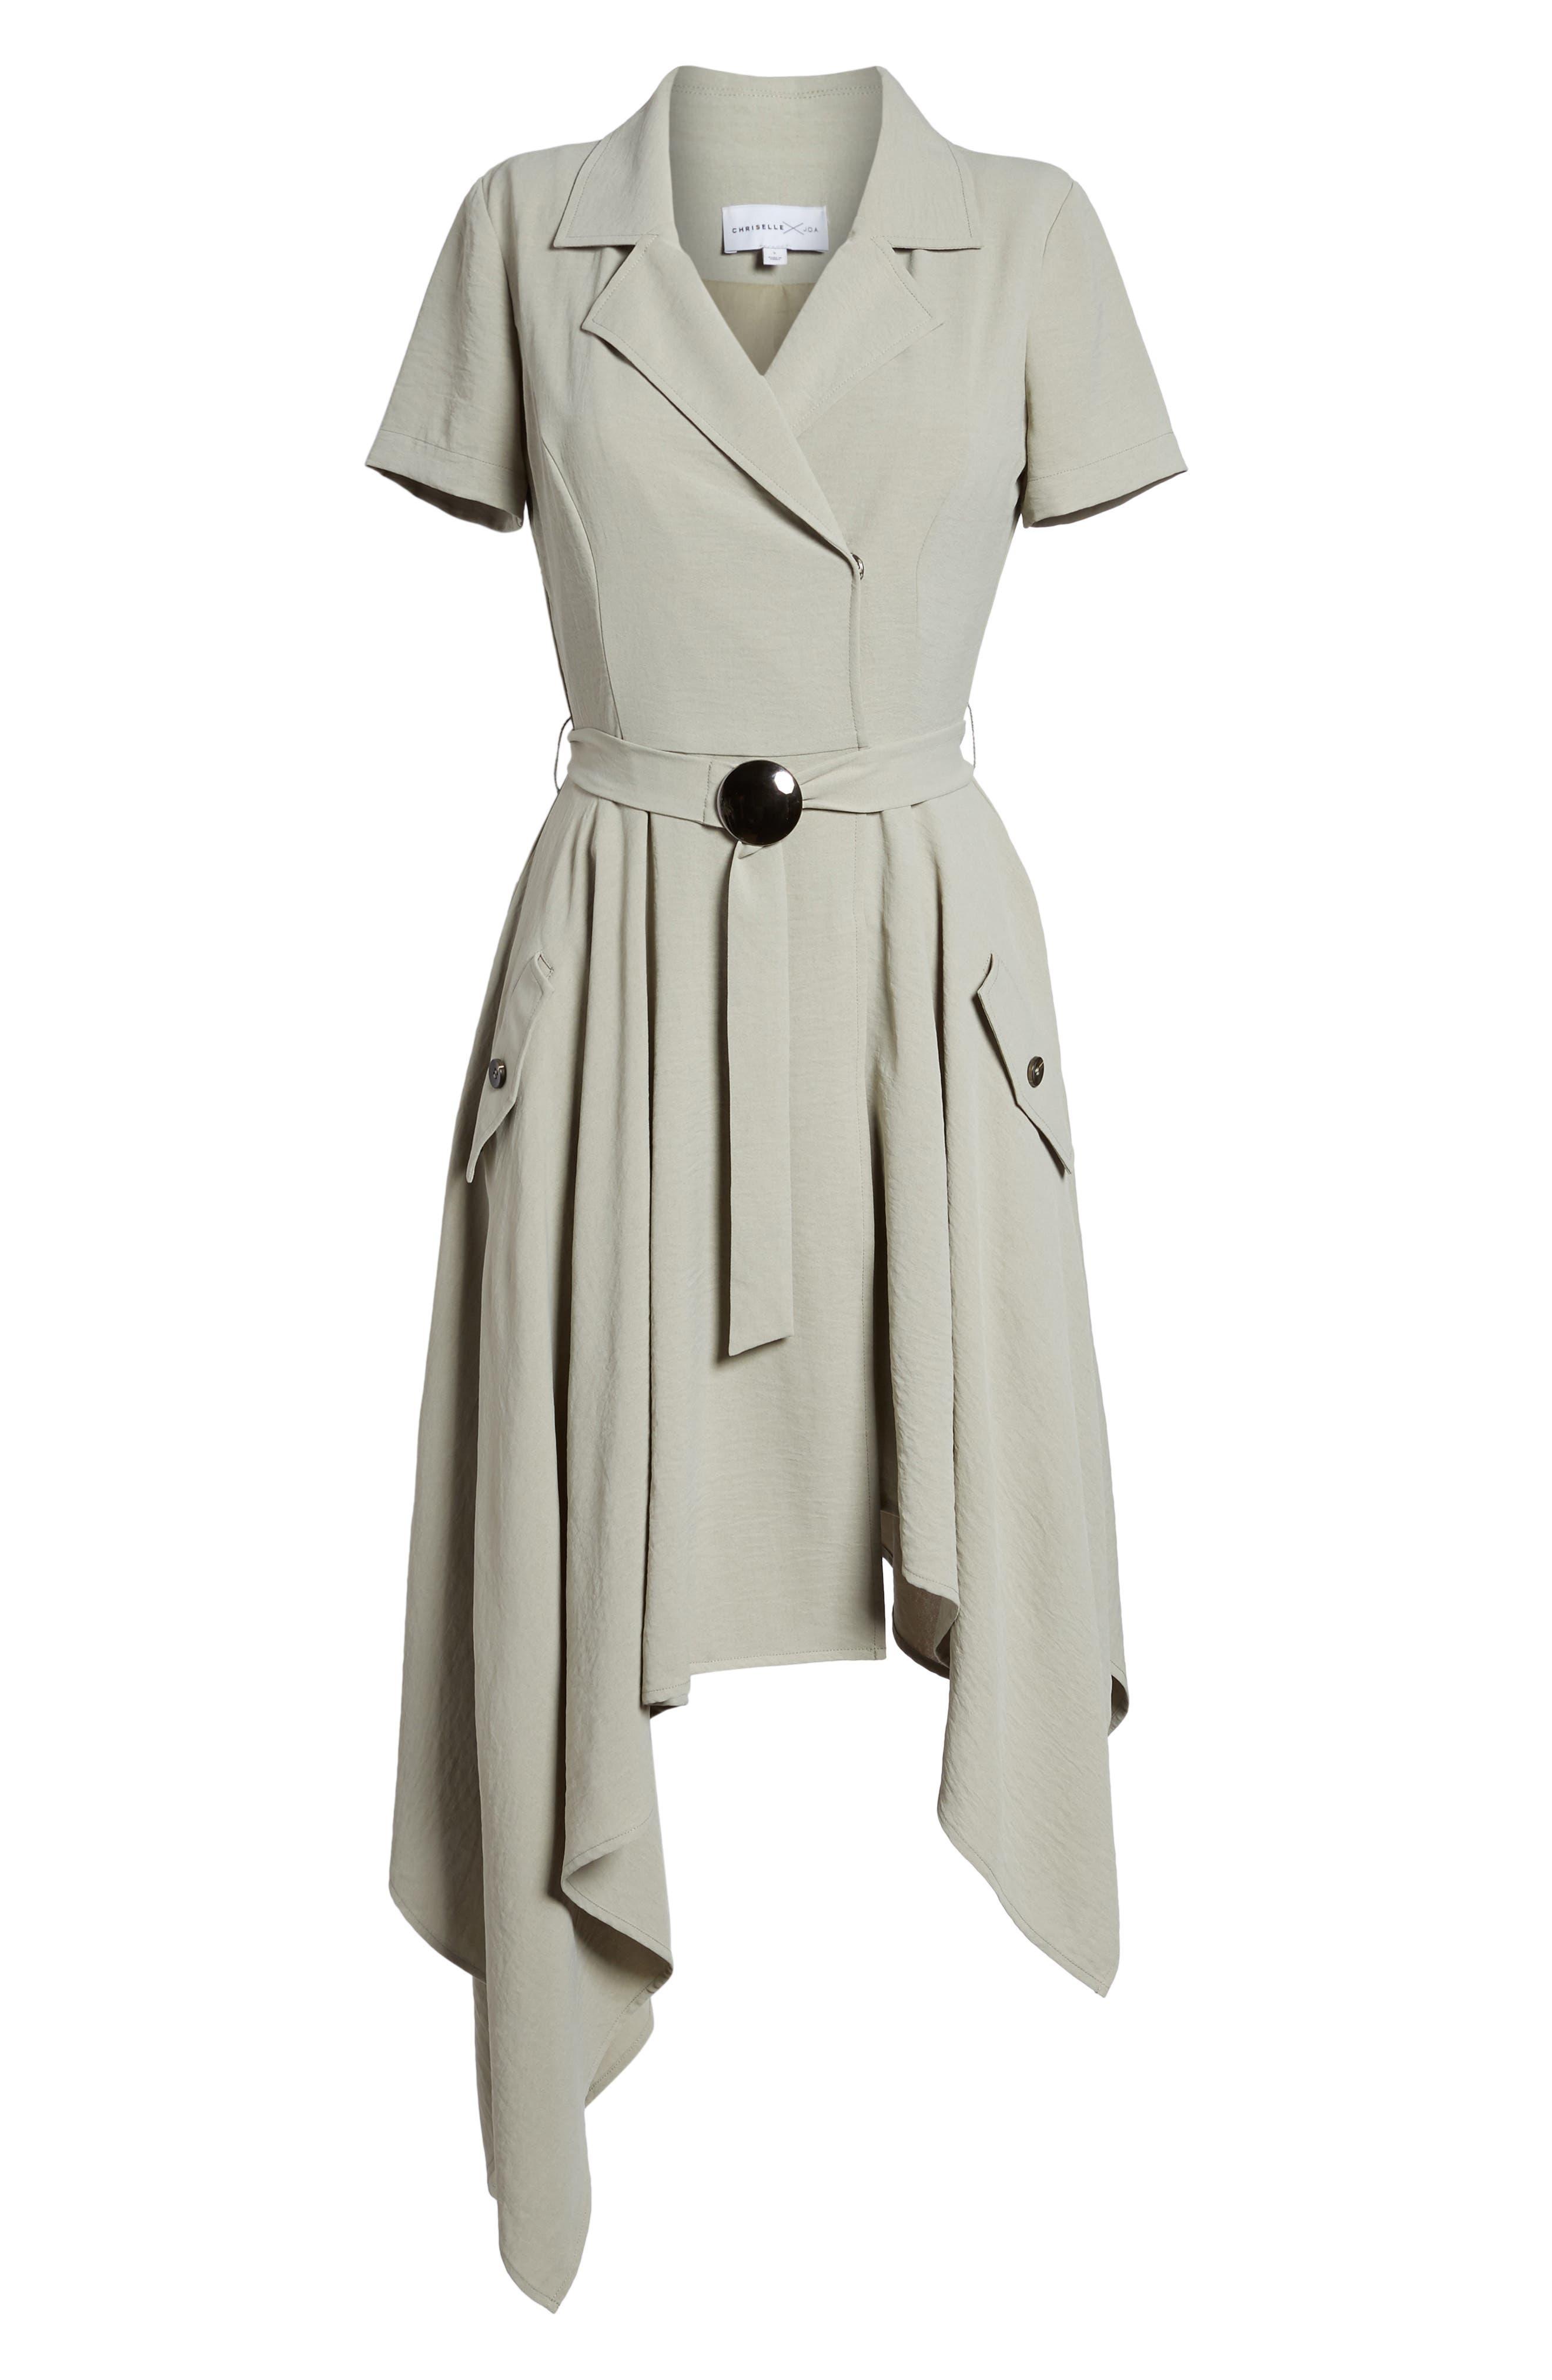 Chriselle x J.O.A. Asymmetrical Trench Dress,                             Alternate thumbnail 7, color,                             300